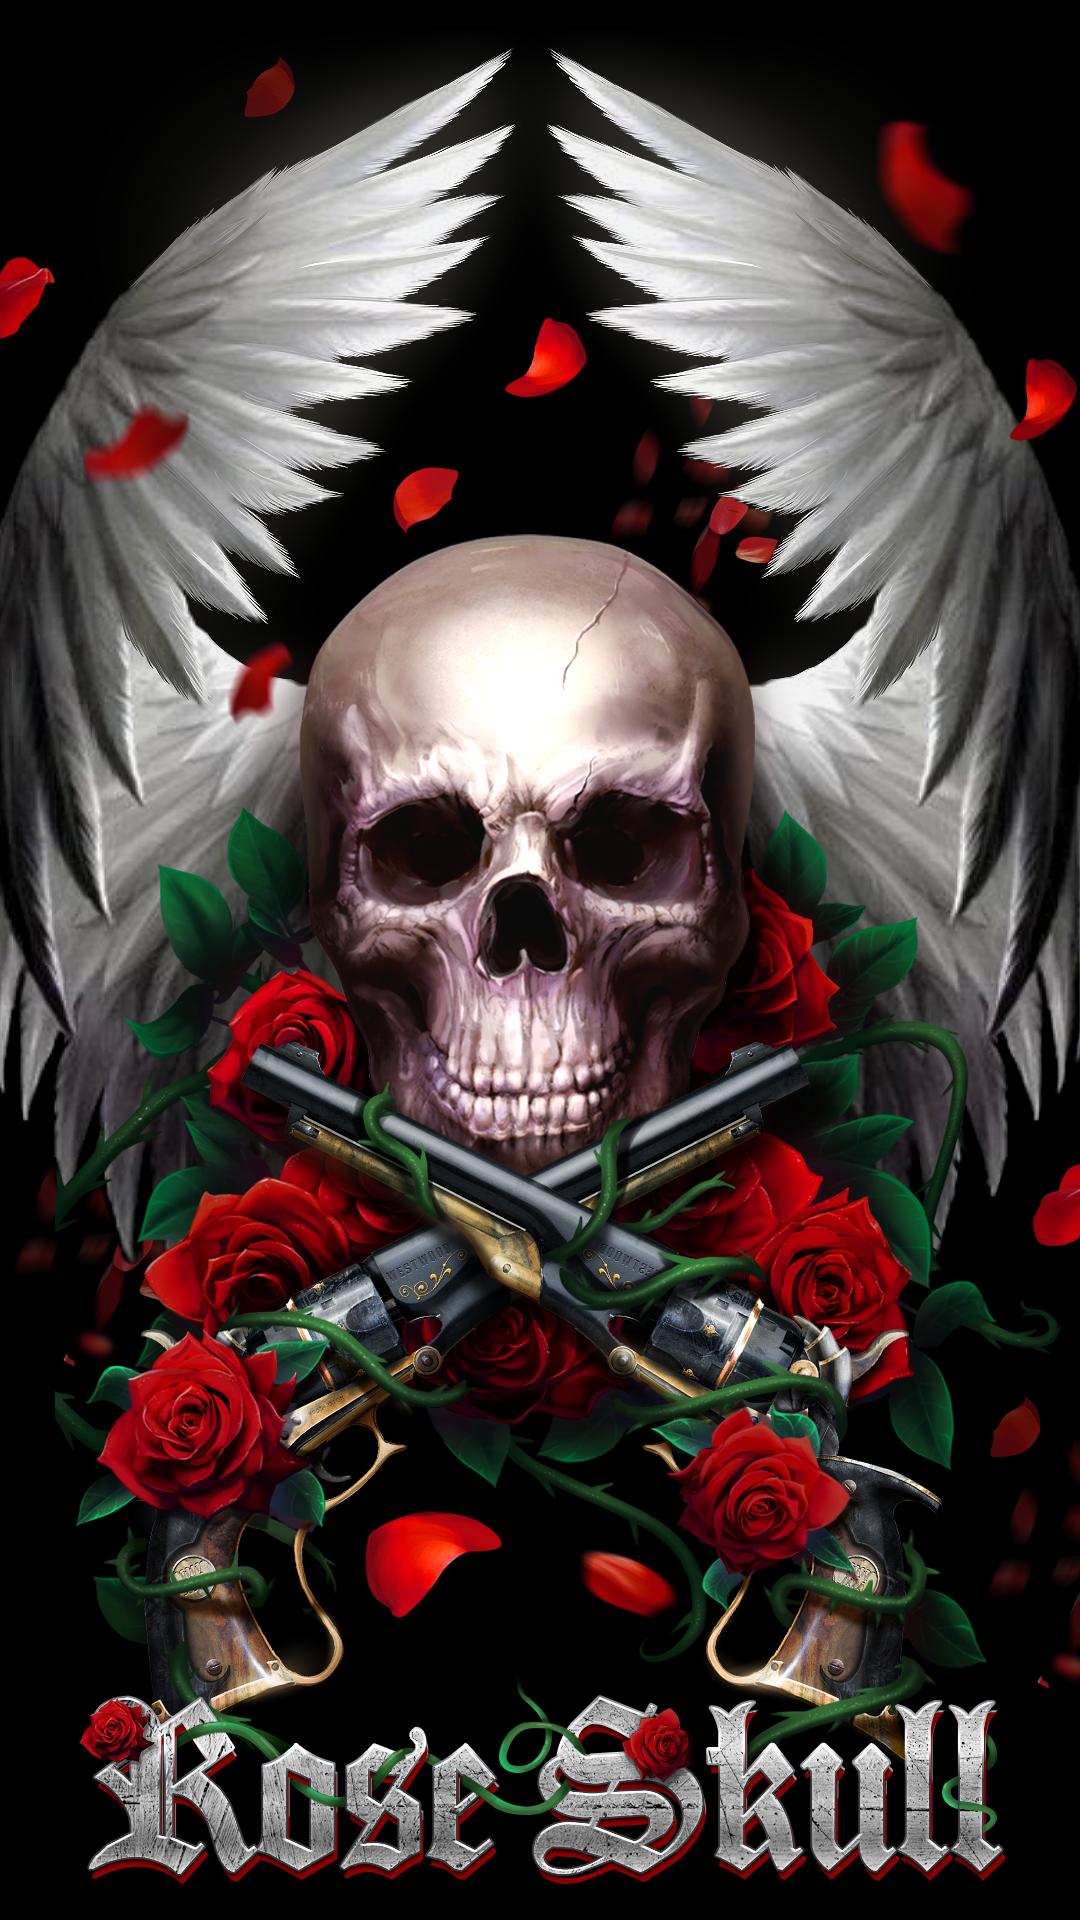 Skullcandy Iphone Wallpaper Beautiful Rose Skull Live Wallpaper Android Live